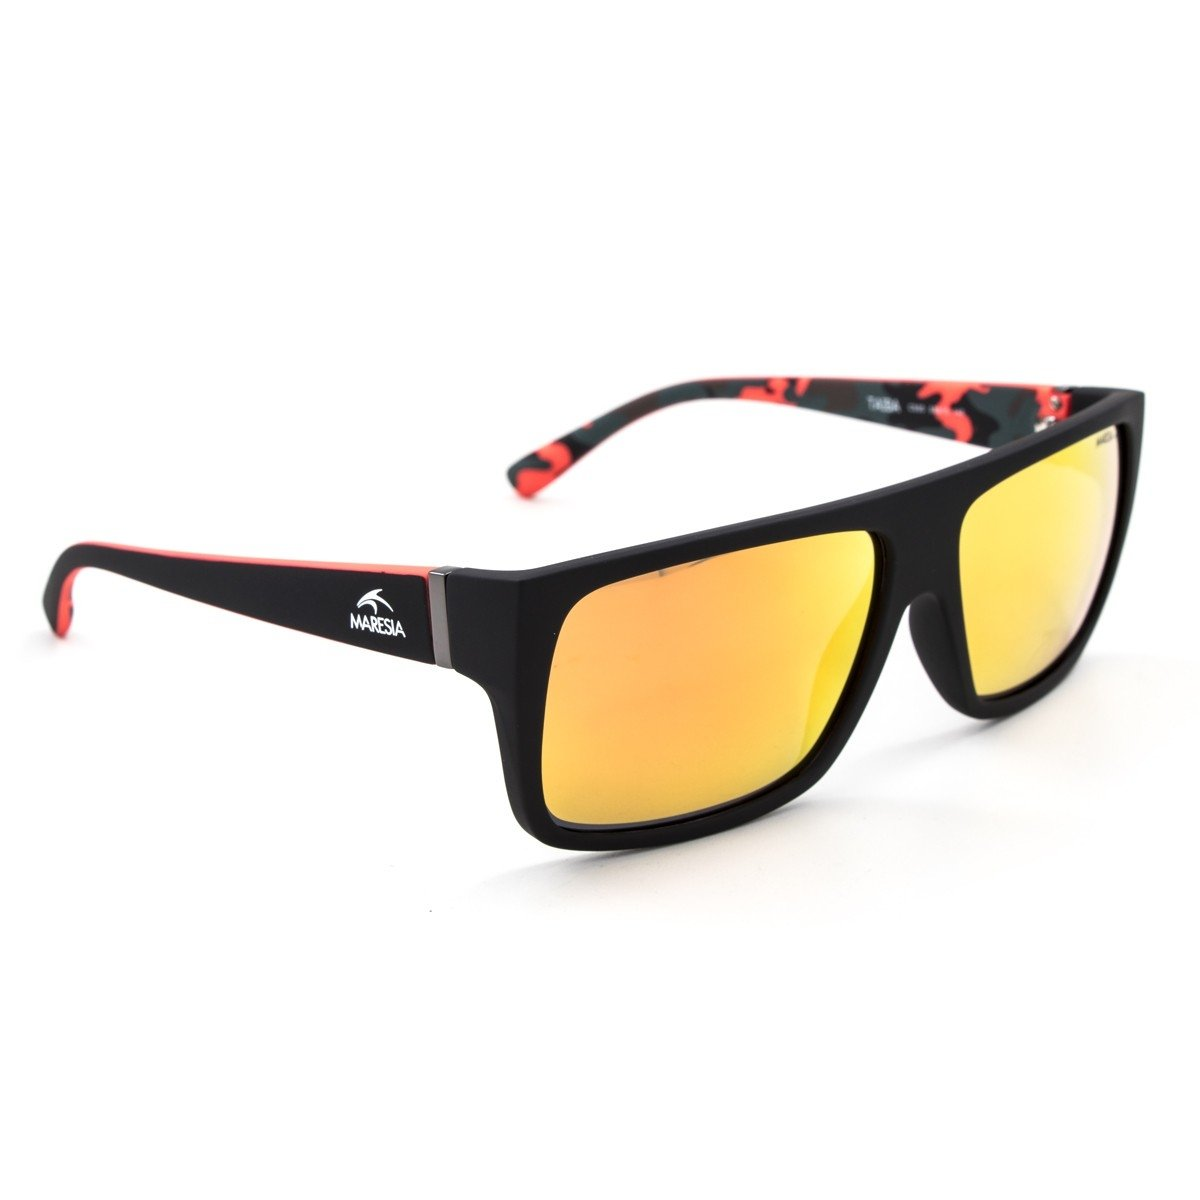 Óculos de sol Taíba Maresia - Compre Agora   Netshoes 57335da0a0